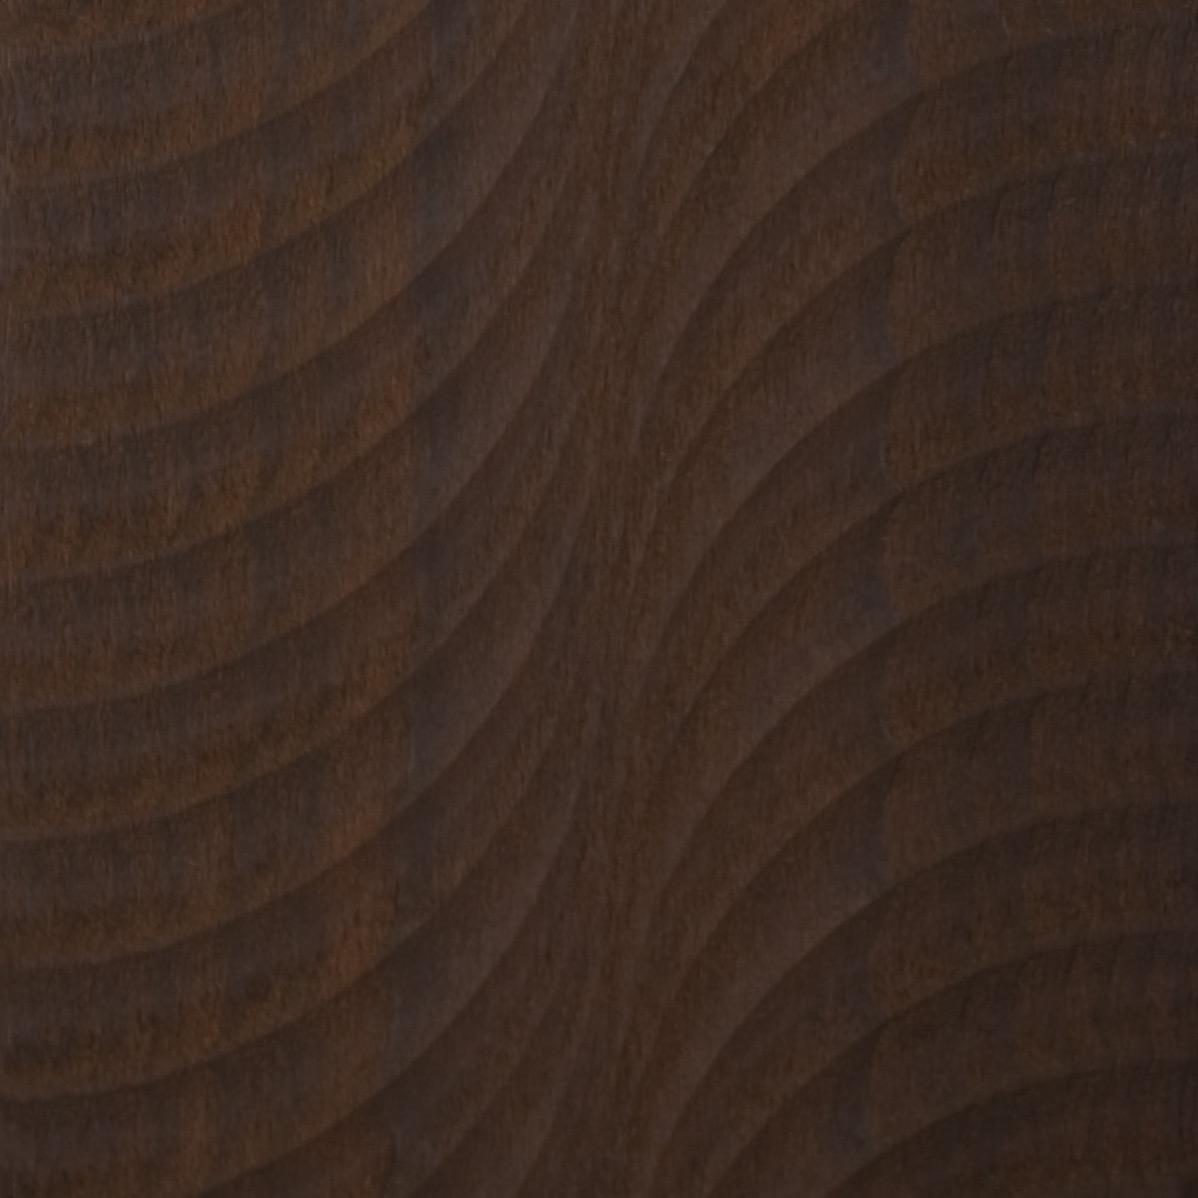 Element7-wide-plank-samples-Fired-rippled-beech